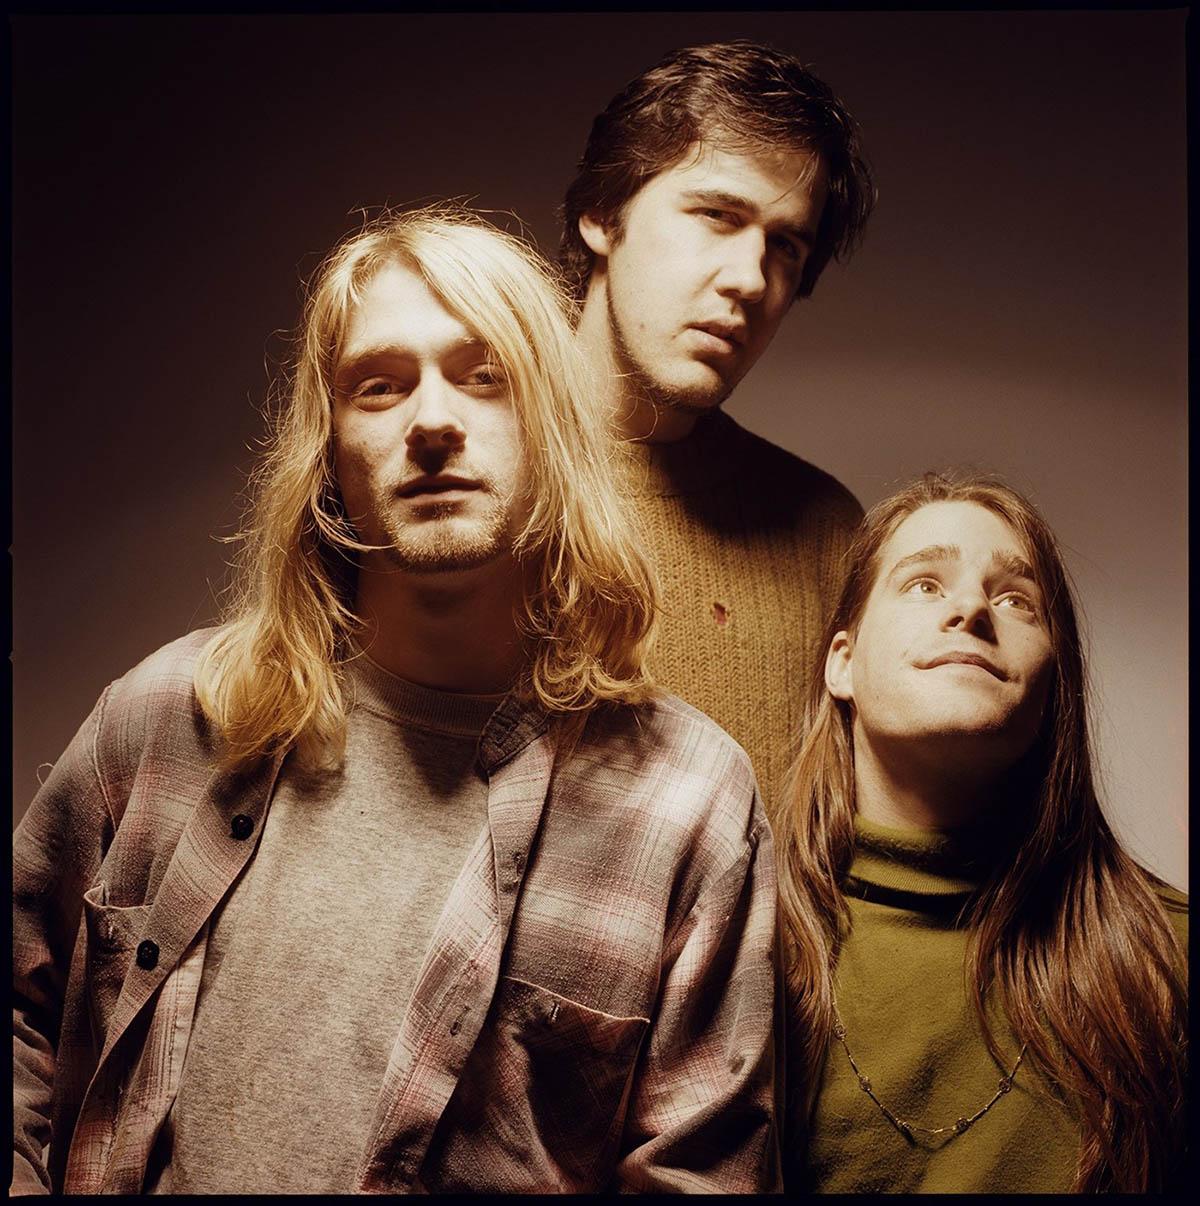 Nirvana, aprile 1990. Kurt Cobain, Krist Novoselic e Chad Channing. © Foto Michael Lavine